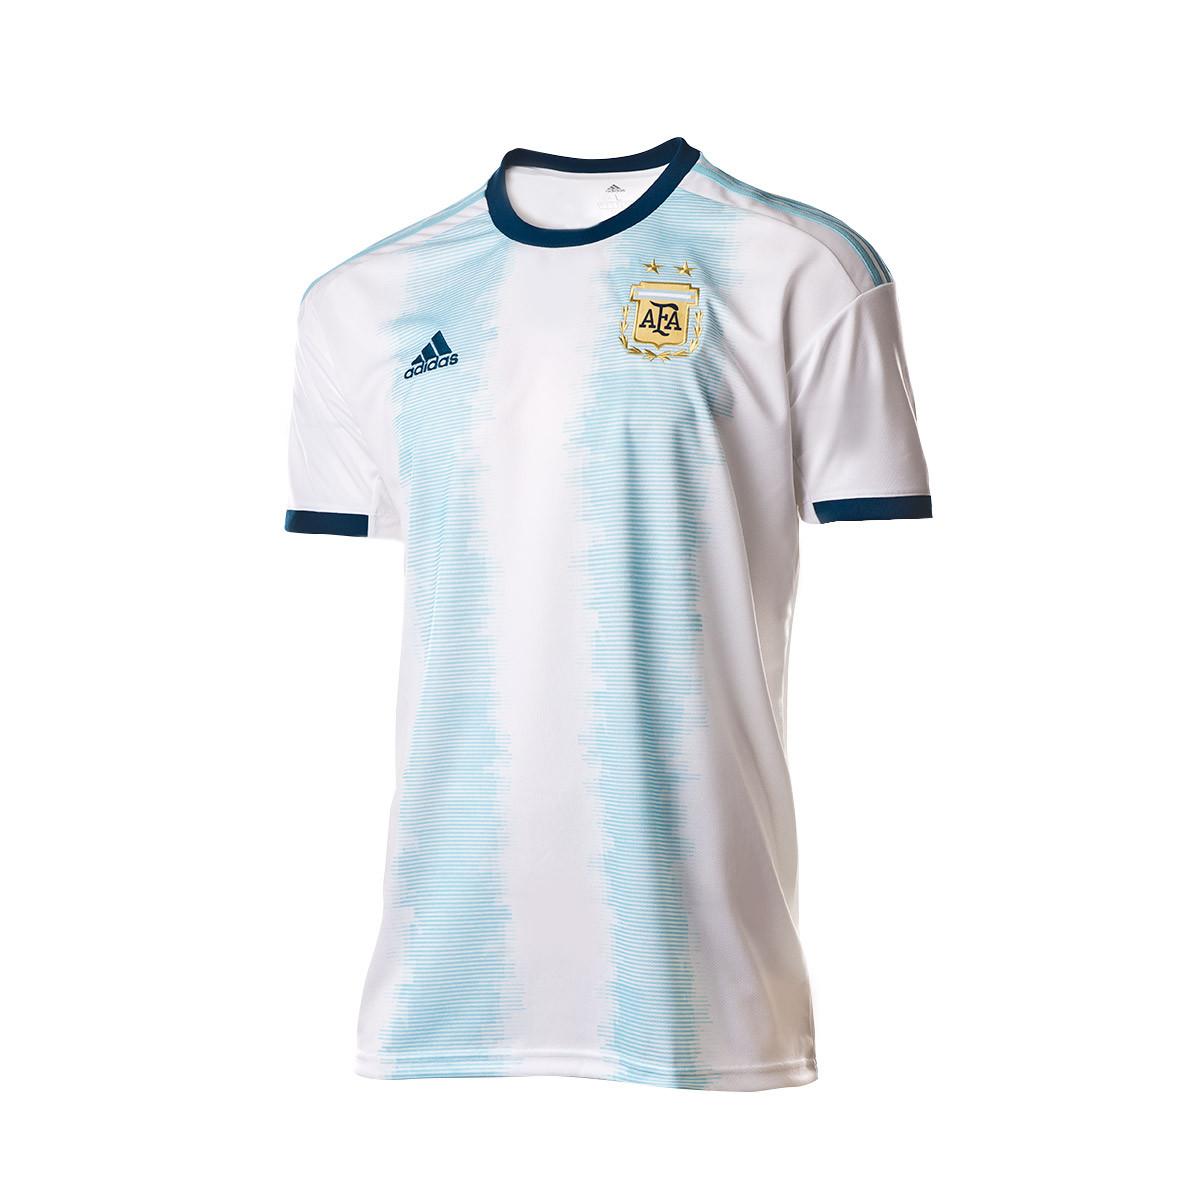 4f40ad2f0 Jersey adidas Argentina 2019 Home White-Light aqua - Football store Fútbol  Emotion